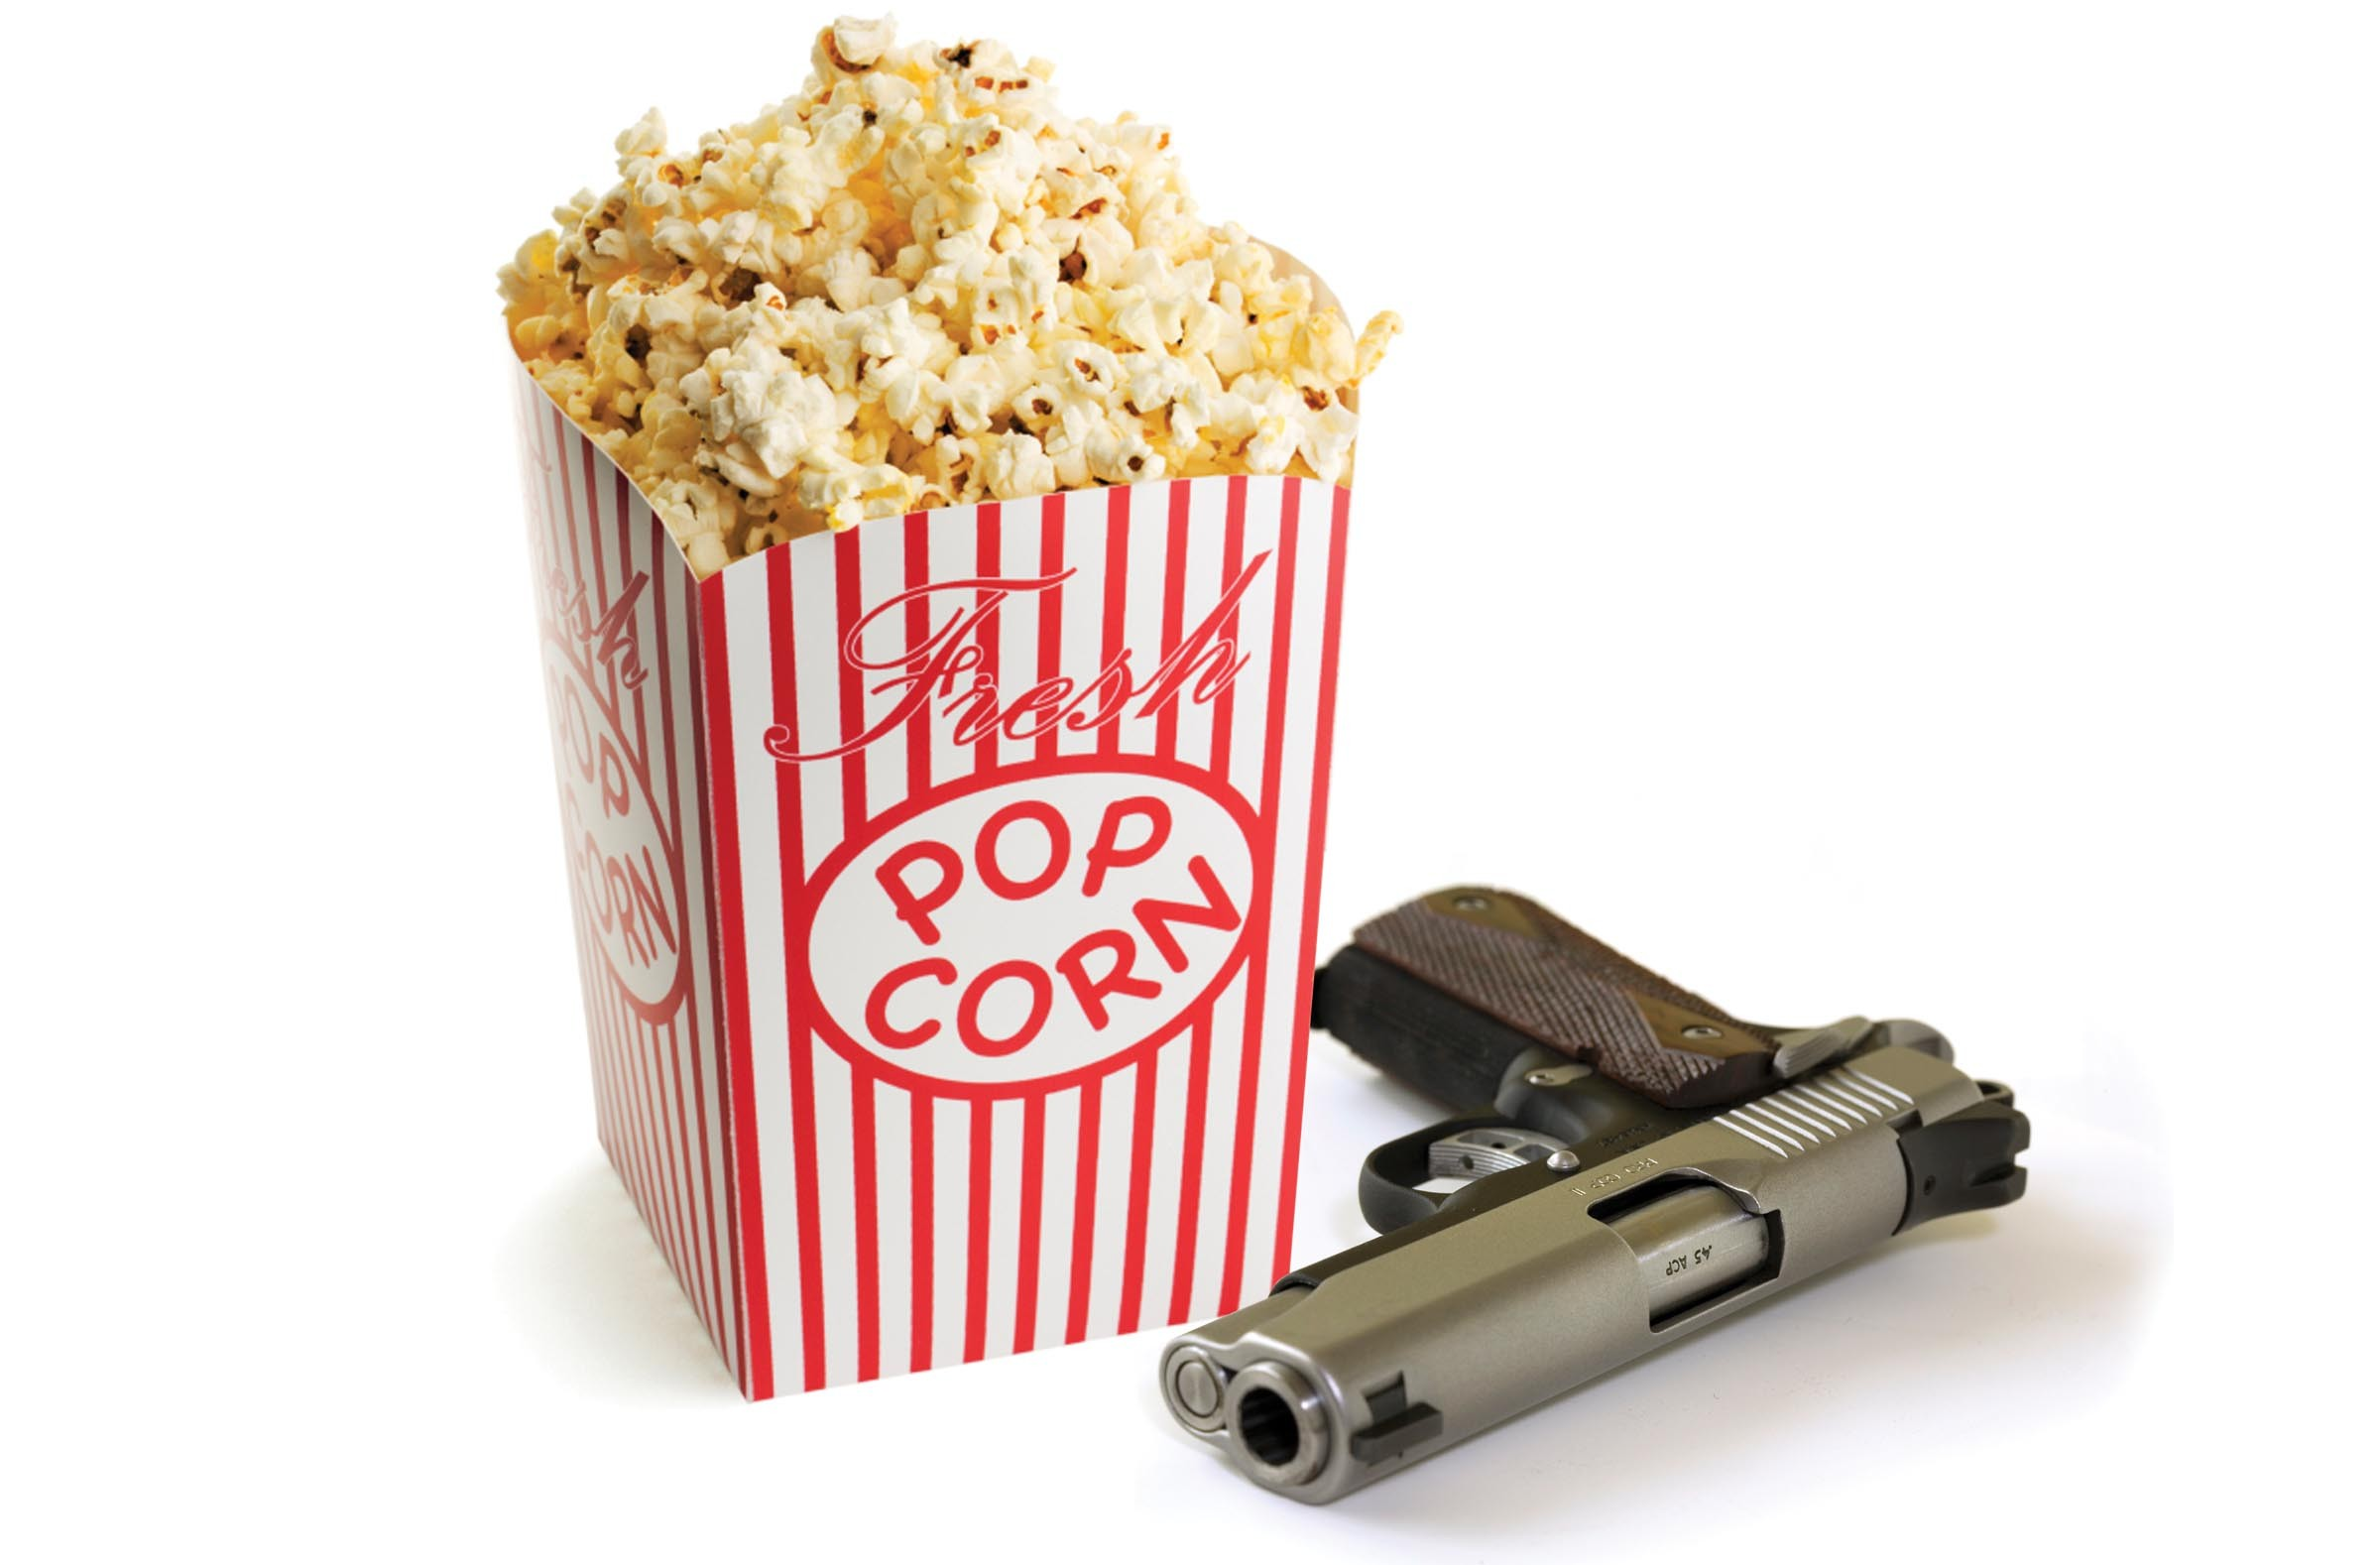 Street Guns And Popcorn